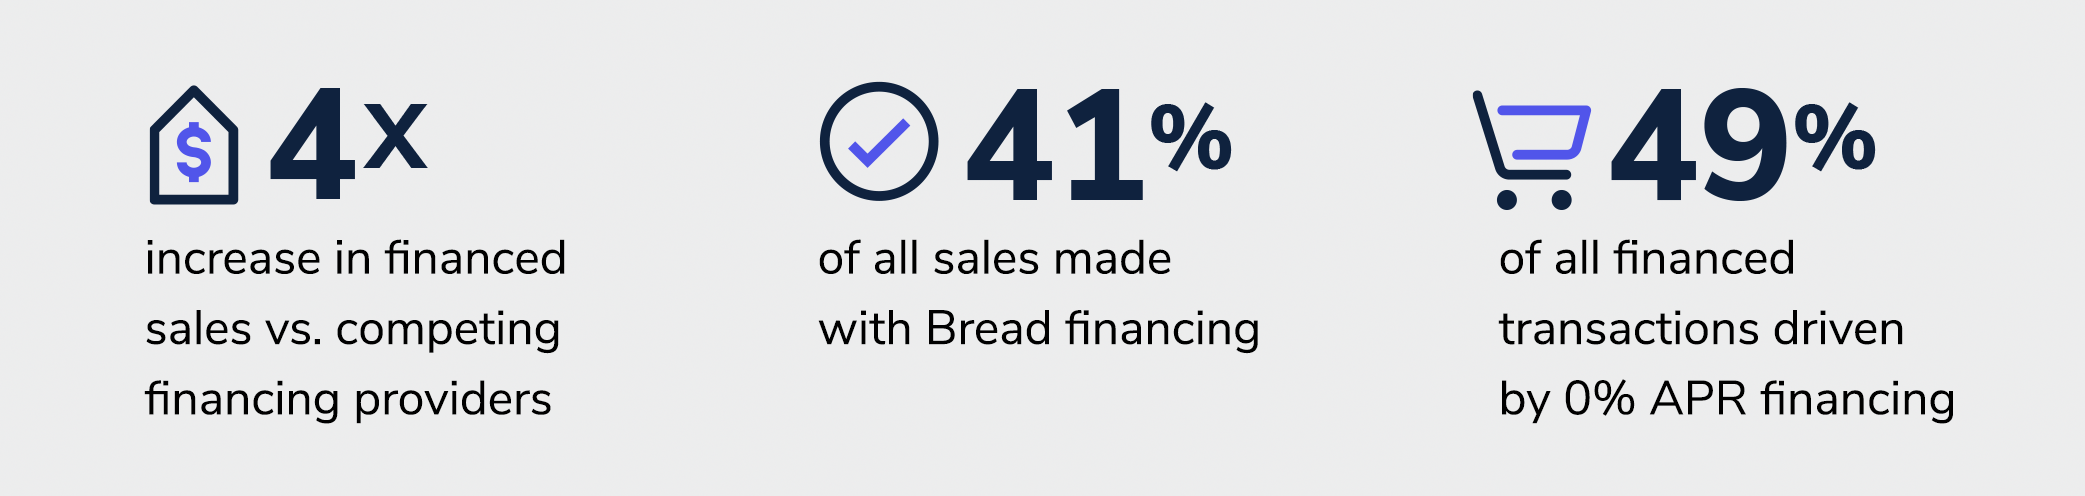 Eargo Bread case study results